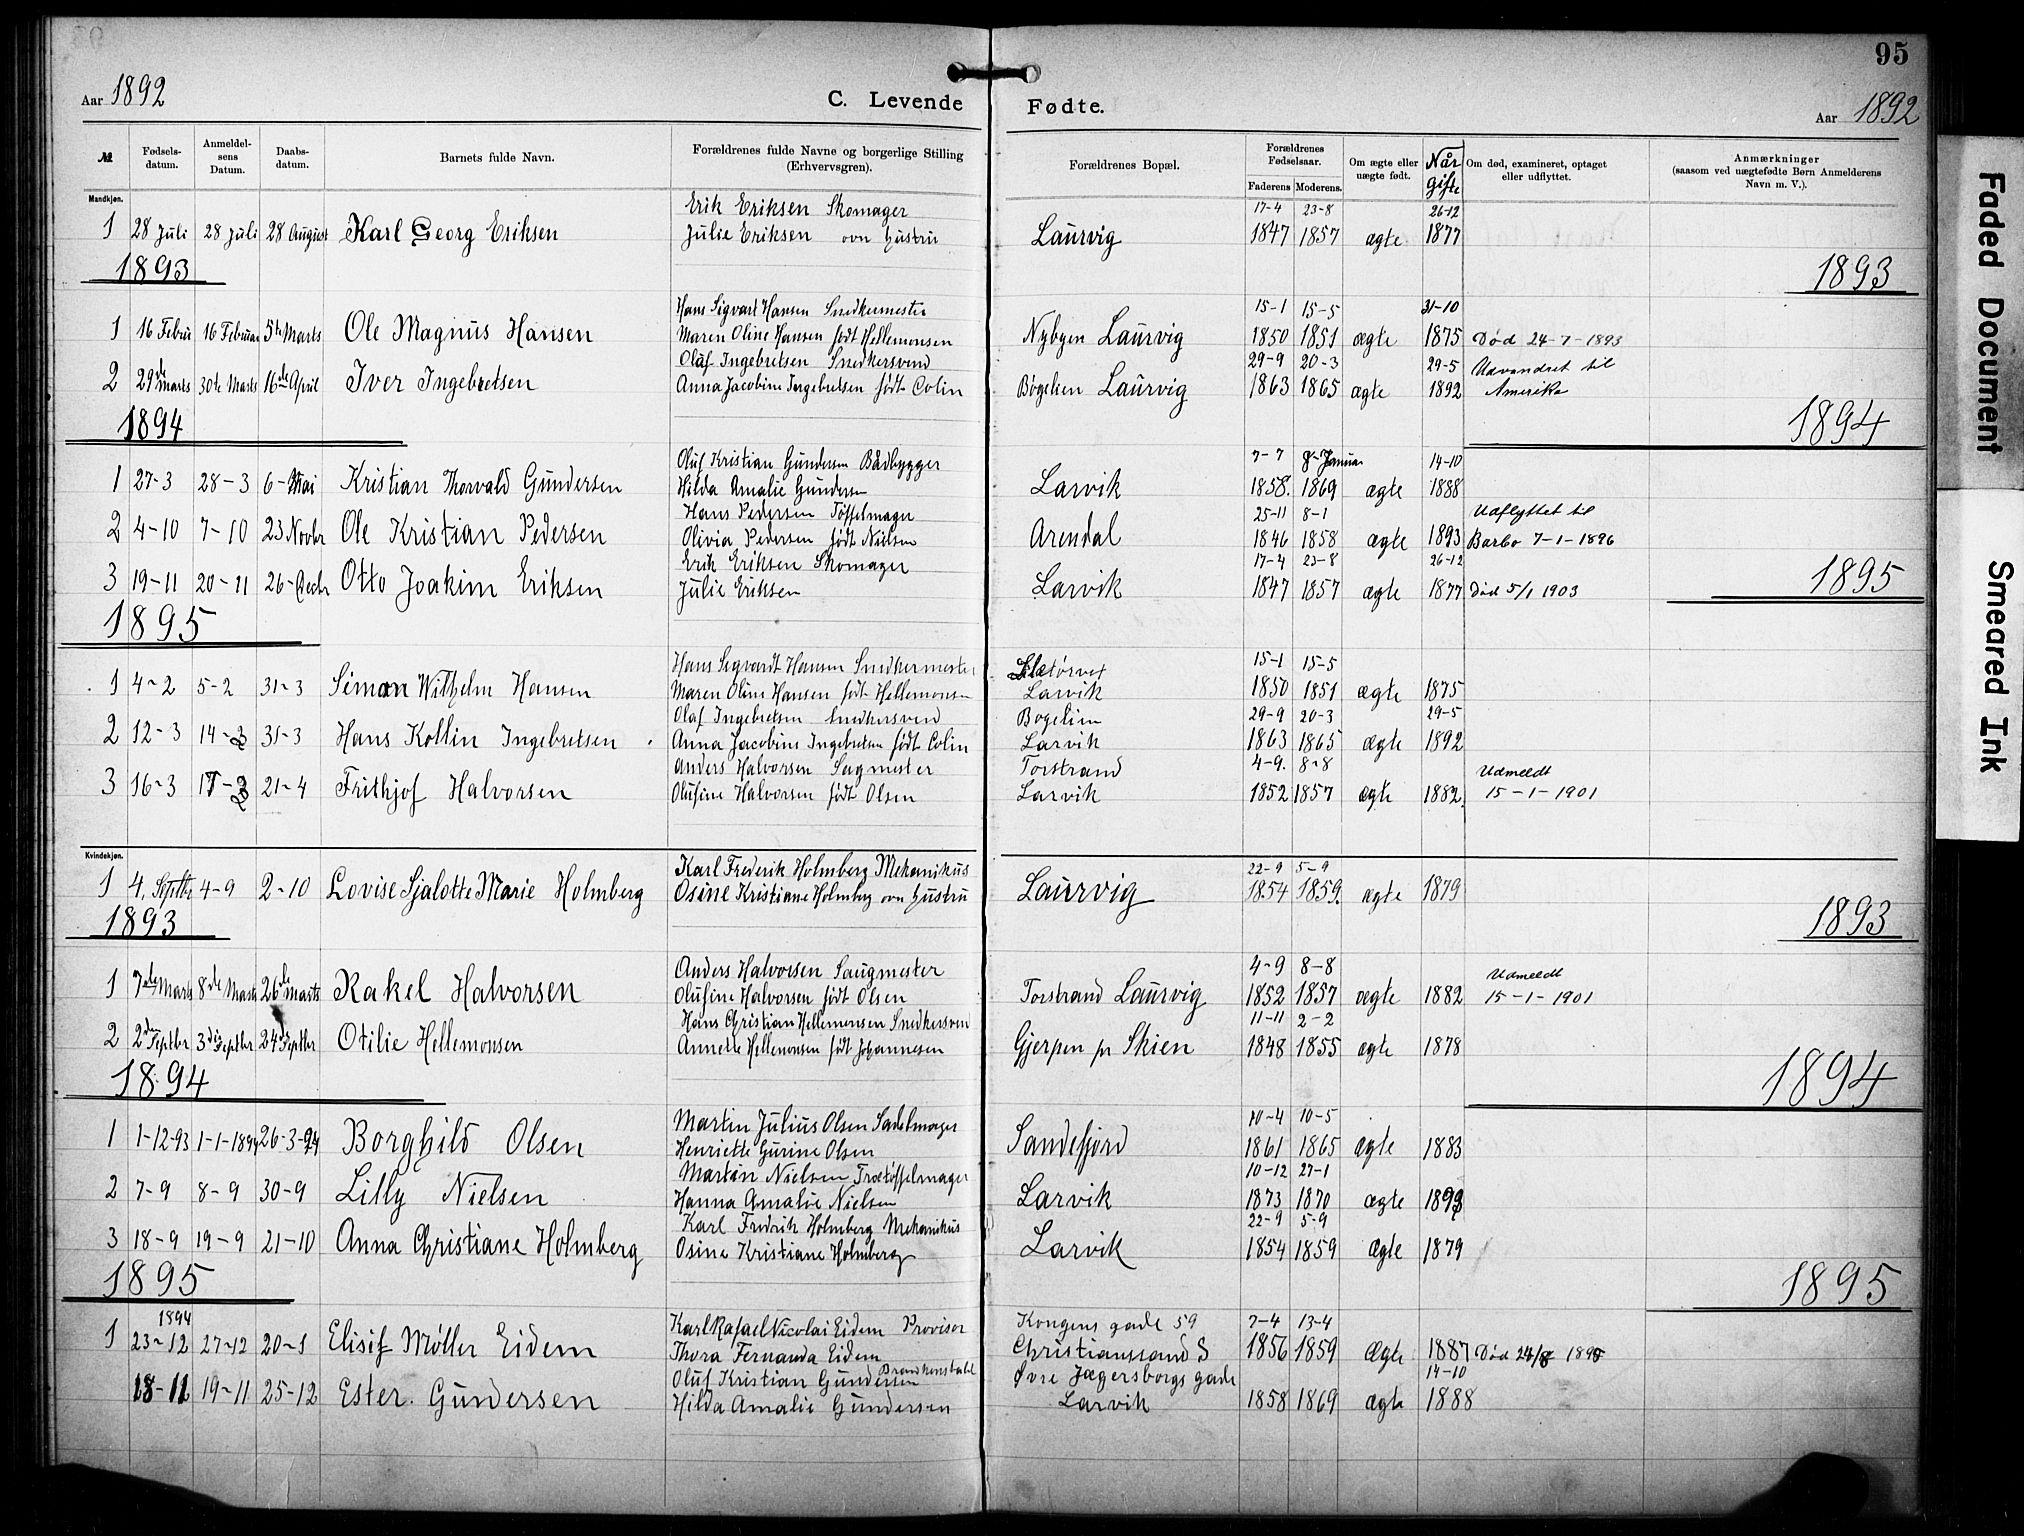 SAKO, Den katolsk-apostoliske menighet i Larvik, F/Fa/L0001: Dissenterprotokoll nr. 1, 1892-1933, s. 95